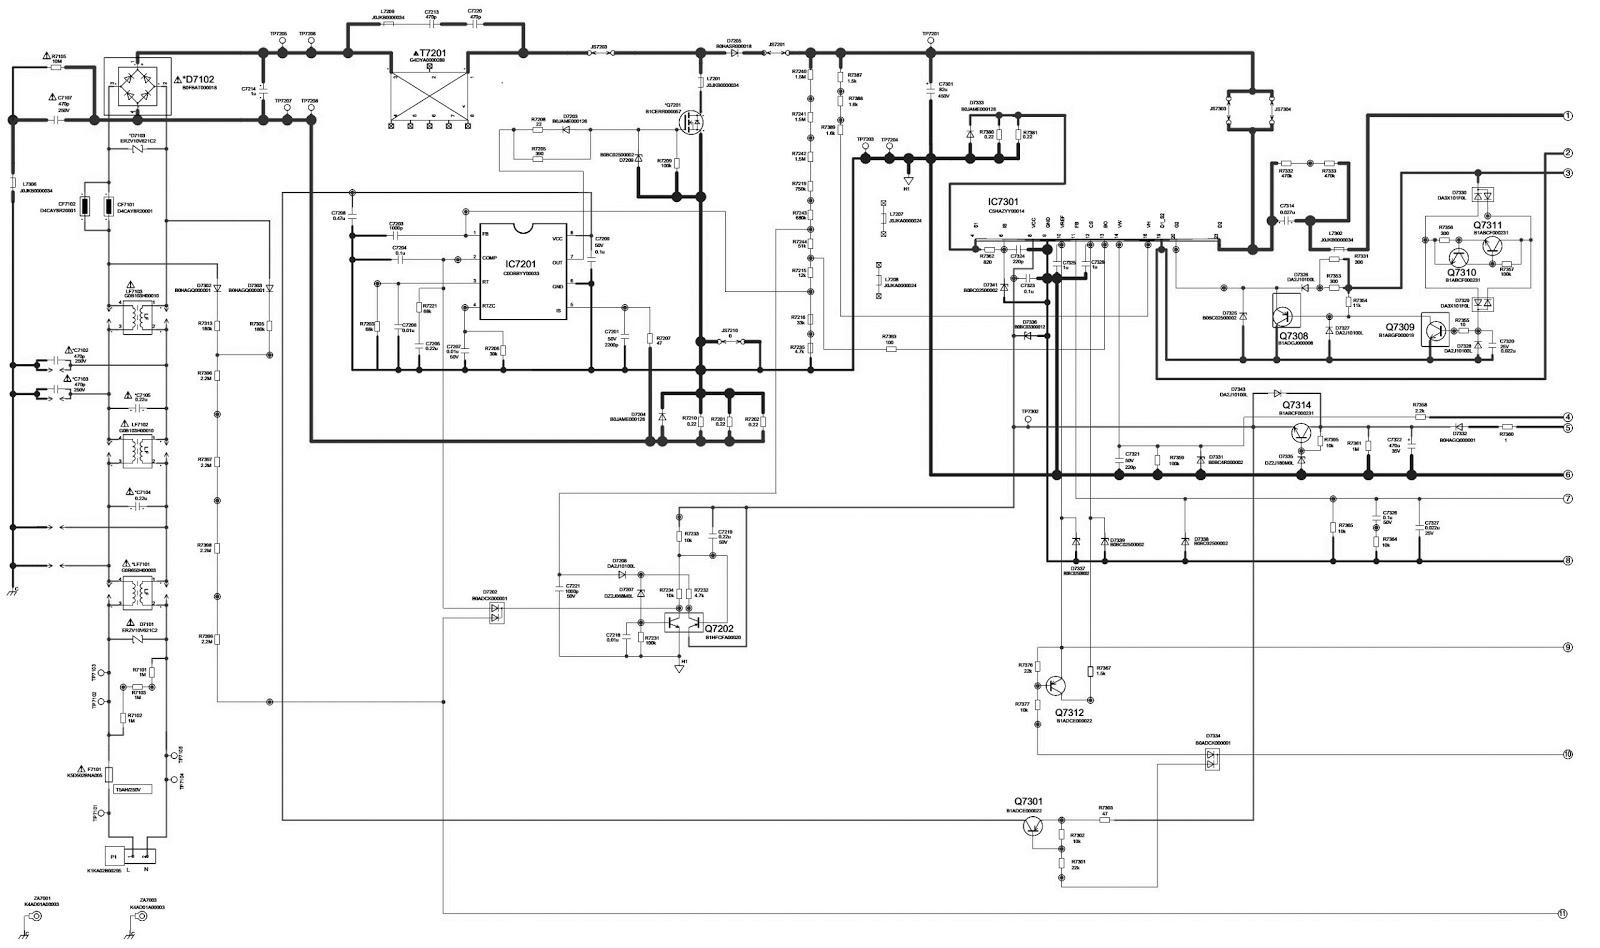 87 Dodge Dakota Fuse Box Free Wiring Diagram For You 93 Diagrams Readingrat 1987 Starter Relay 1996 Panel